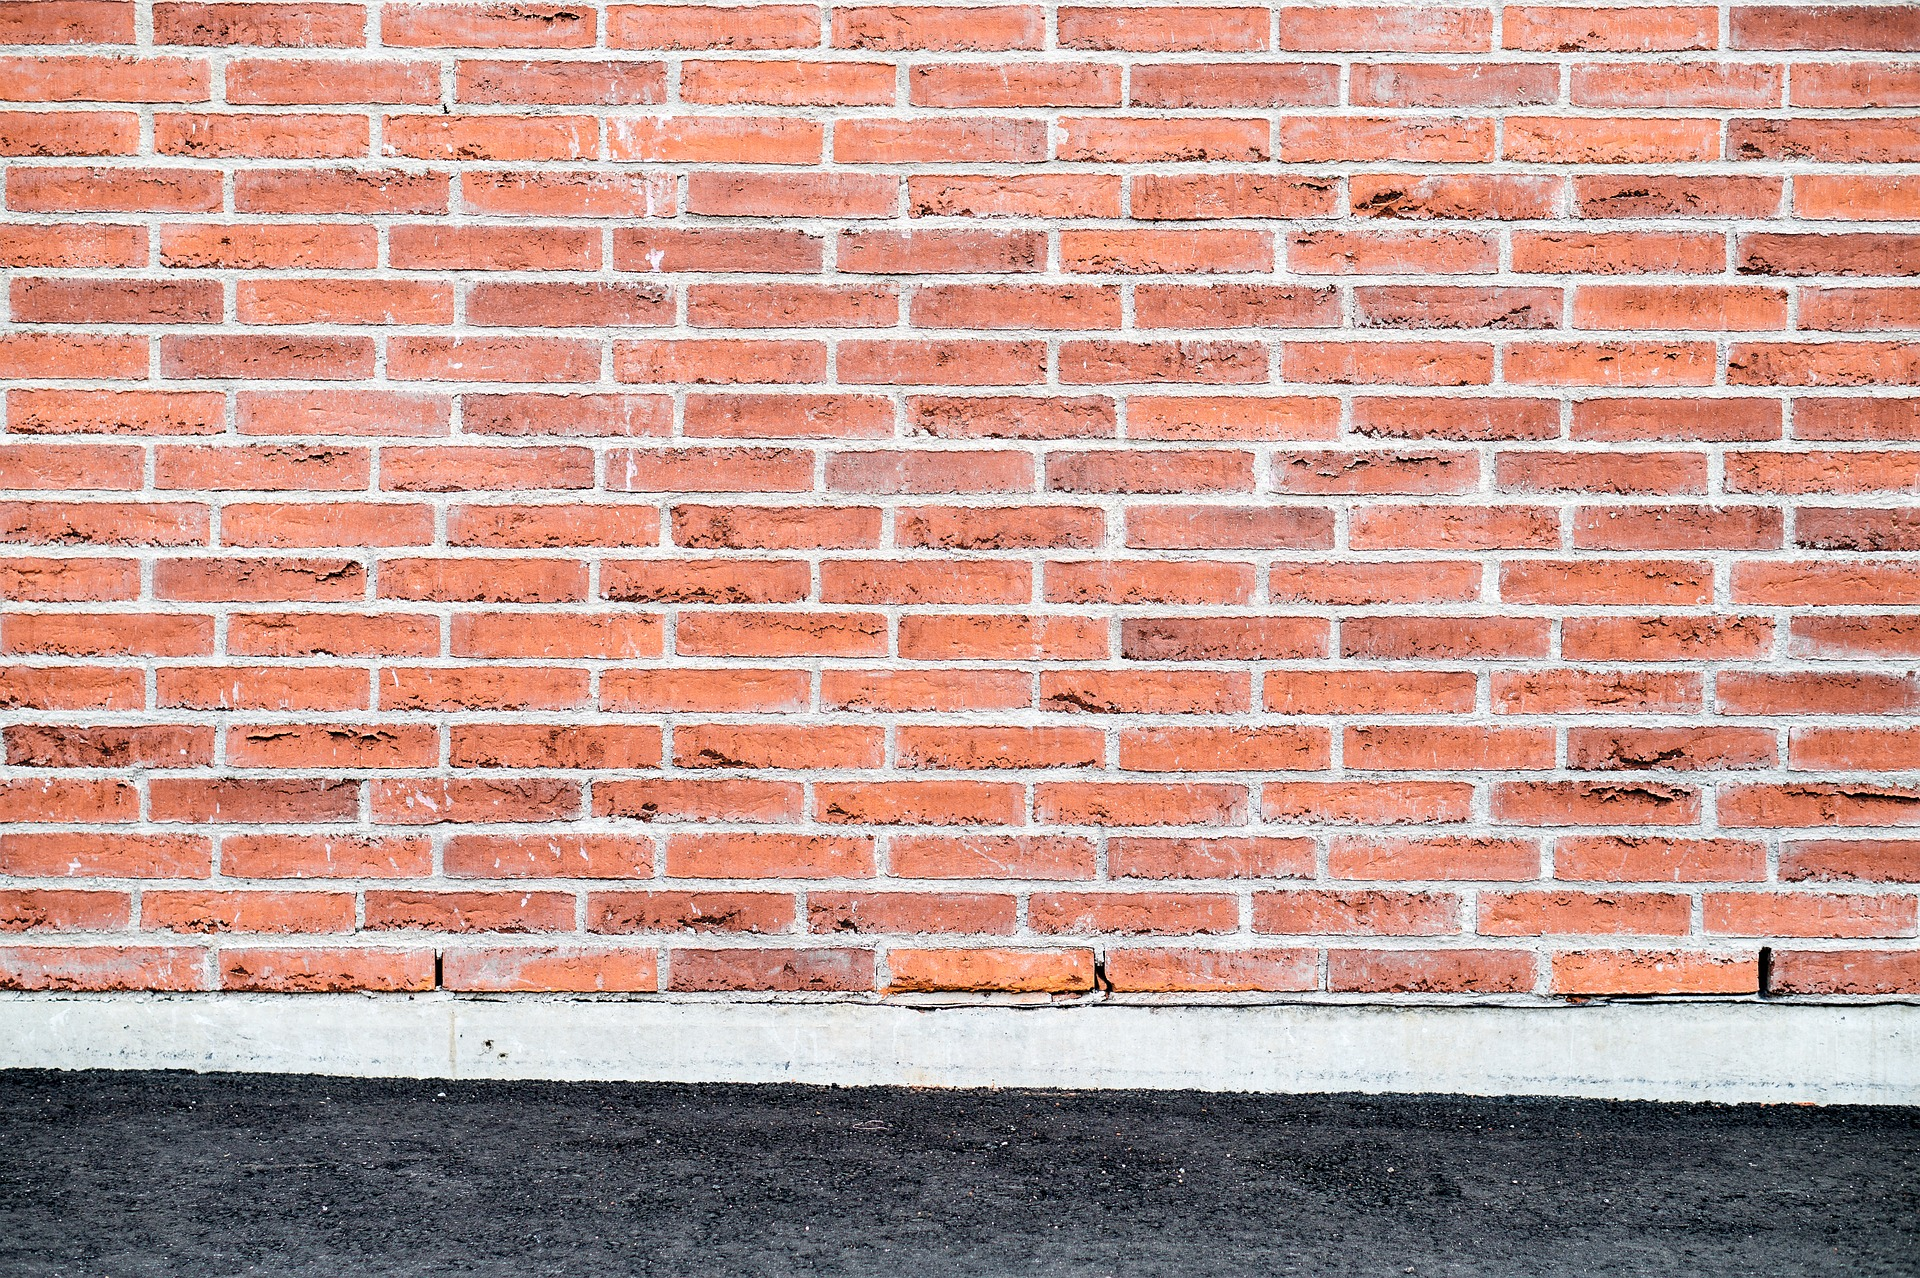 Brick Texture, Architecture, Block, Brick, Construction, HQ Photo